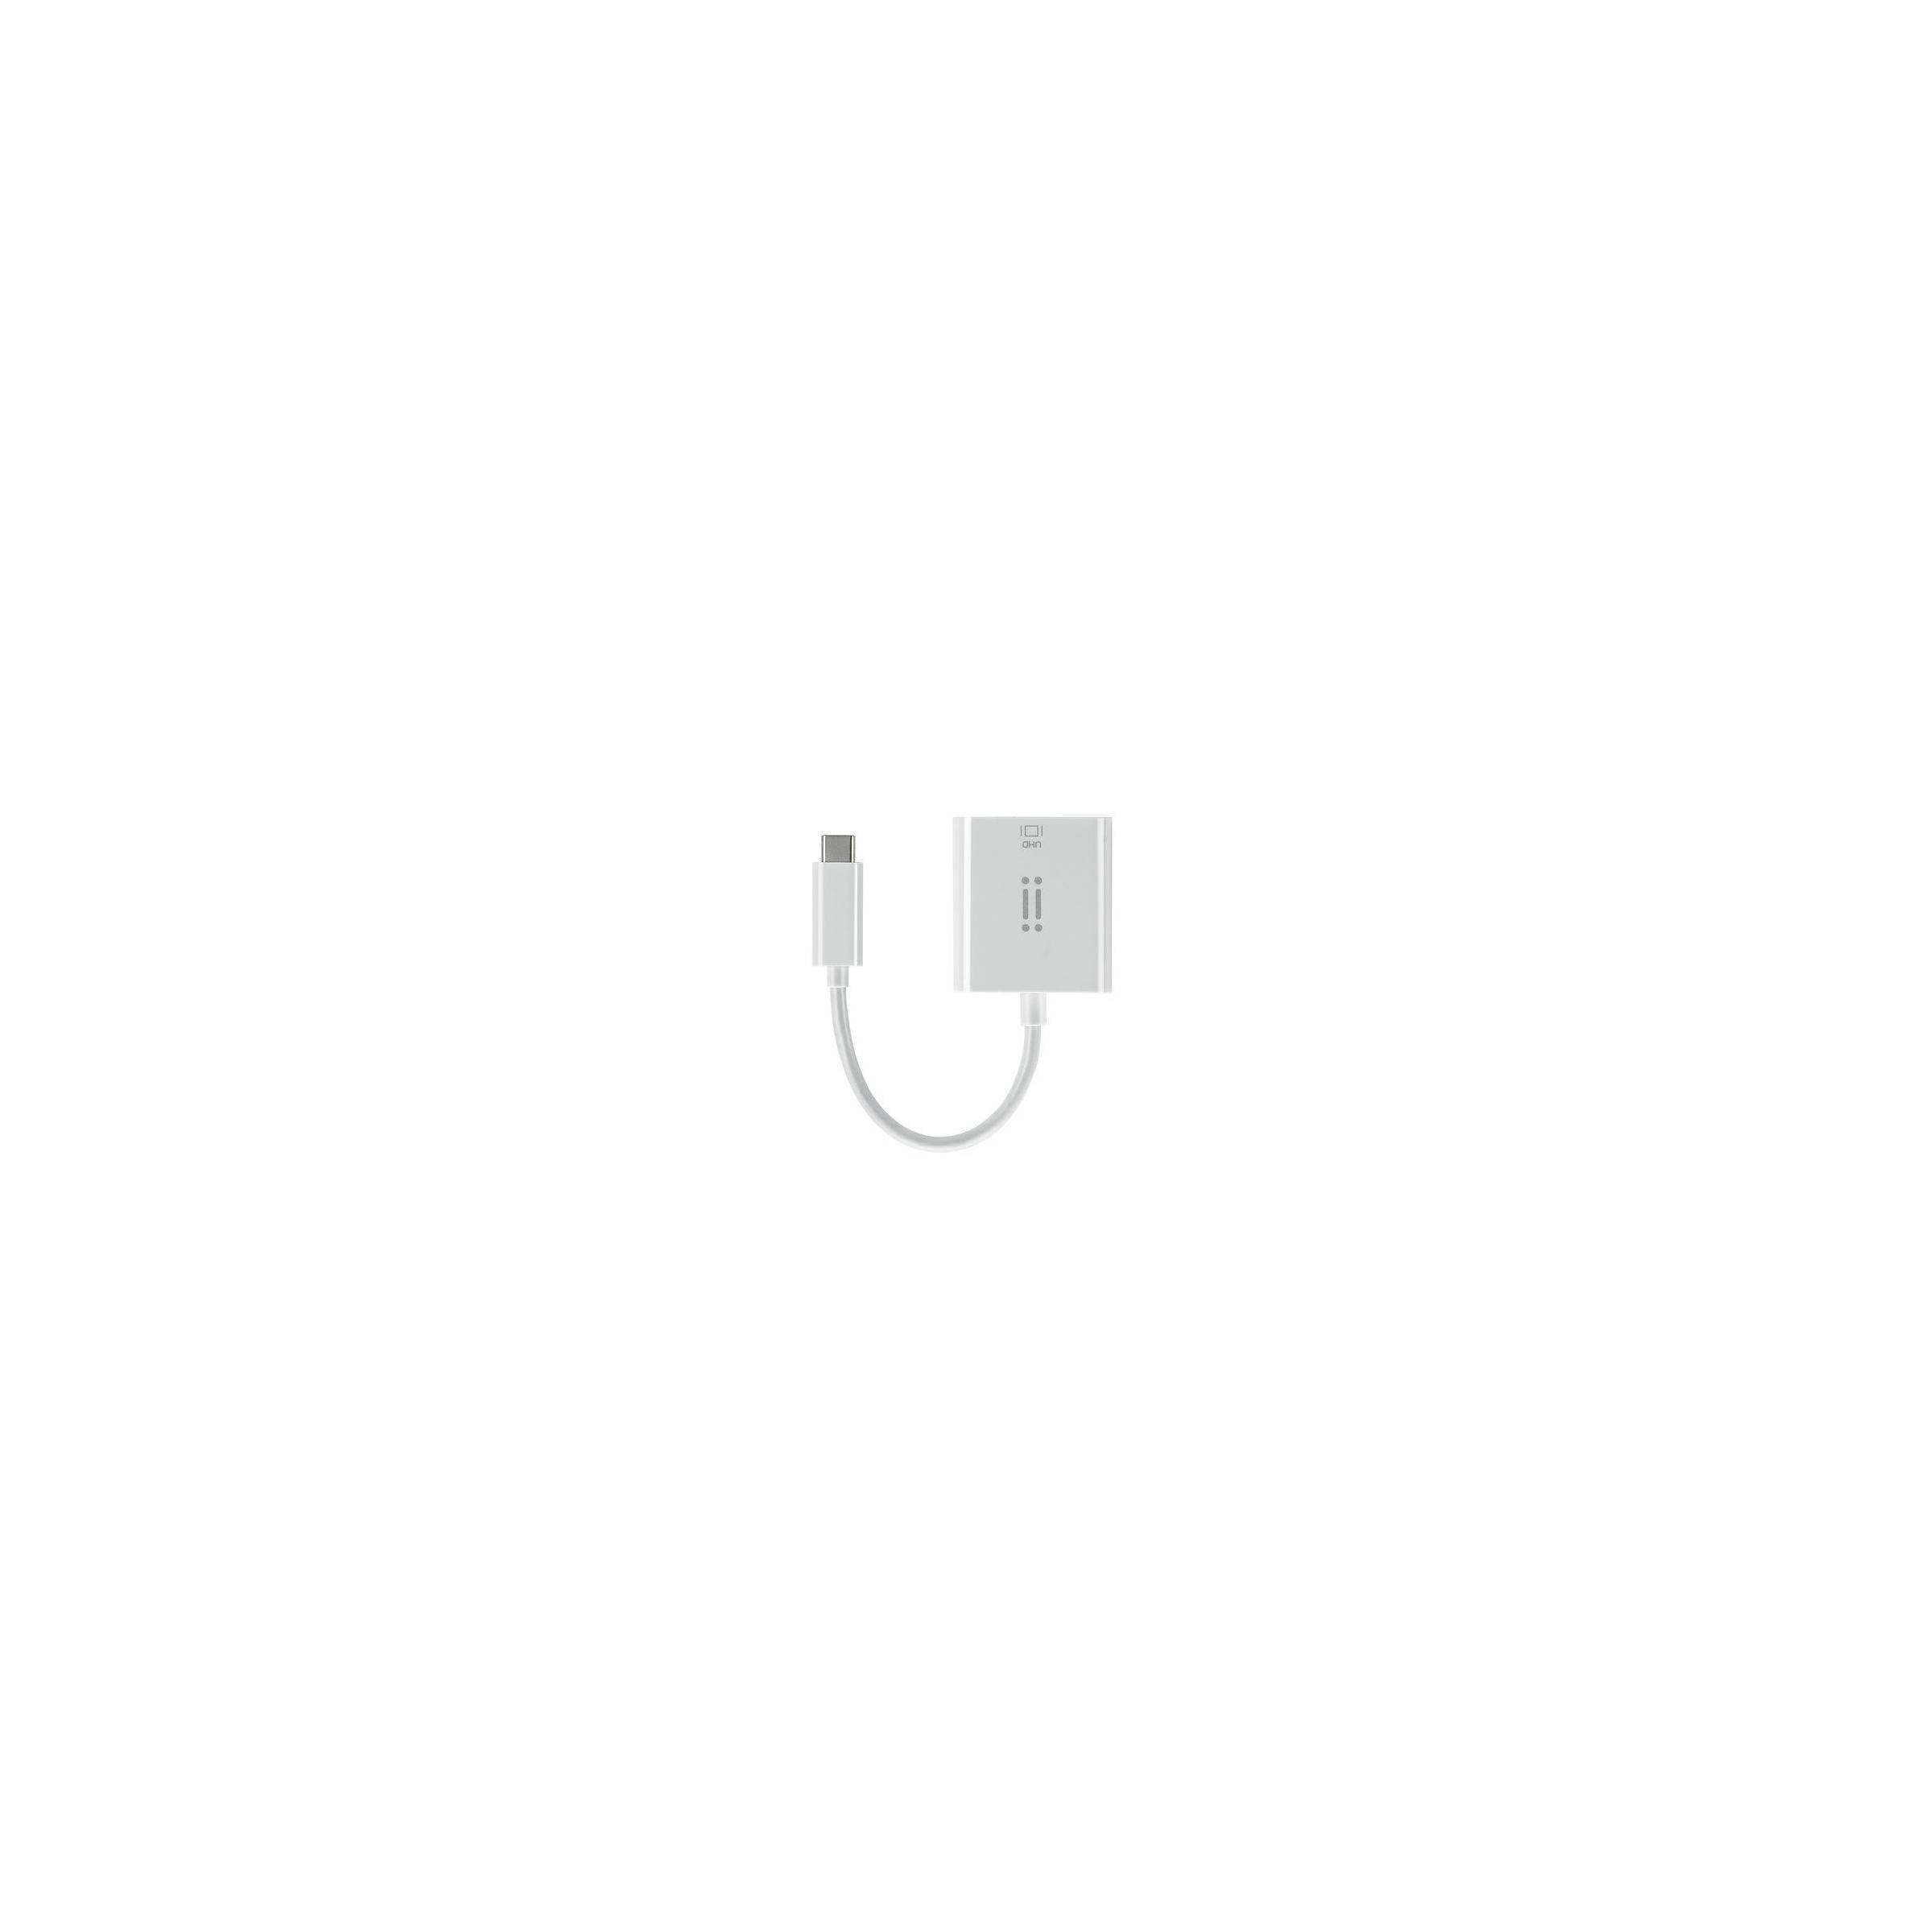 aiino Aiino usb-c til hdmi adapter 4k@60hz fra mackabler.dk